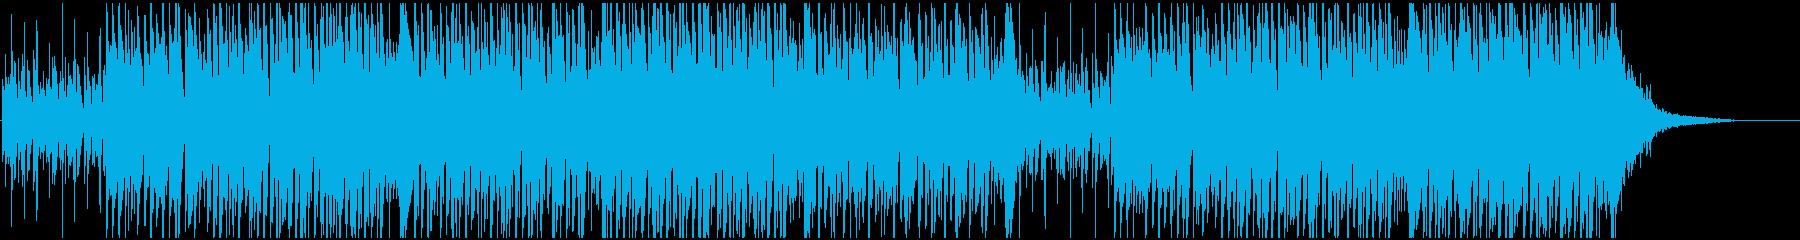 EDM・モチベーション・情熱・プレゼンの再生済みの波形